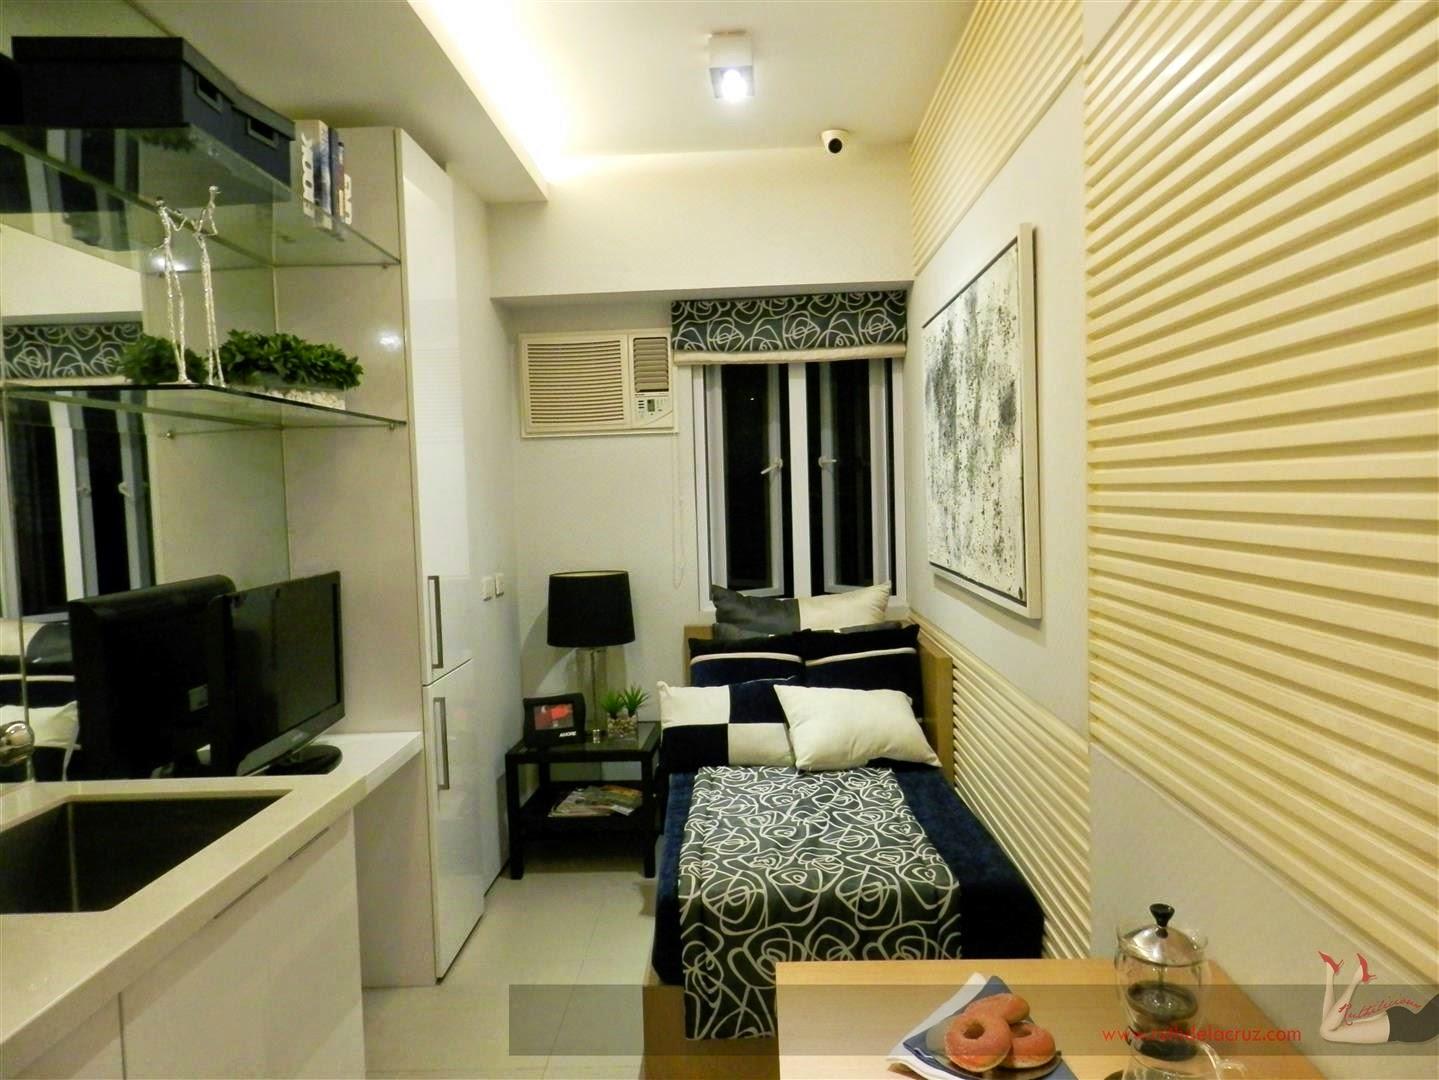 Ruthdelacruz Travel And Lifestyle Blog City Living Design Ideas For New Condo Space